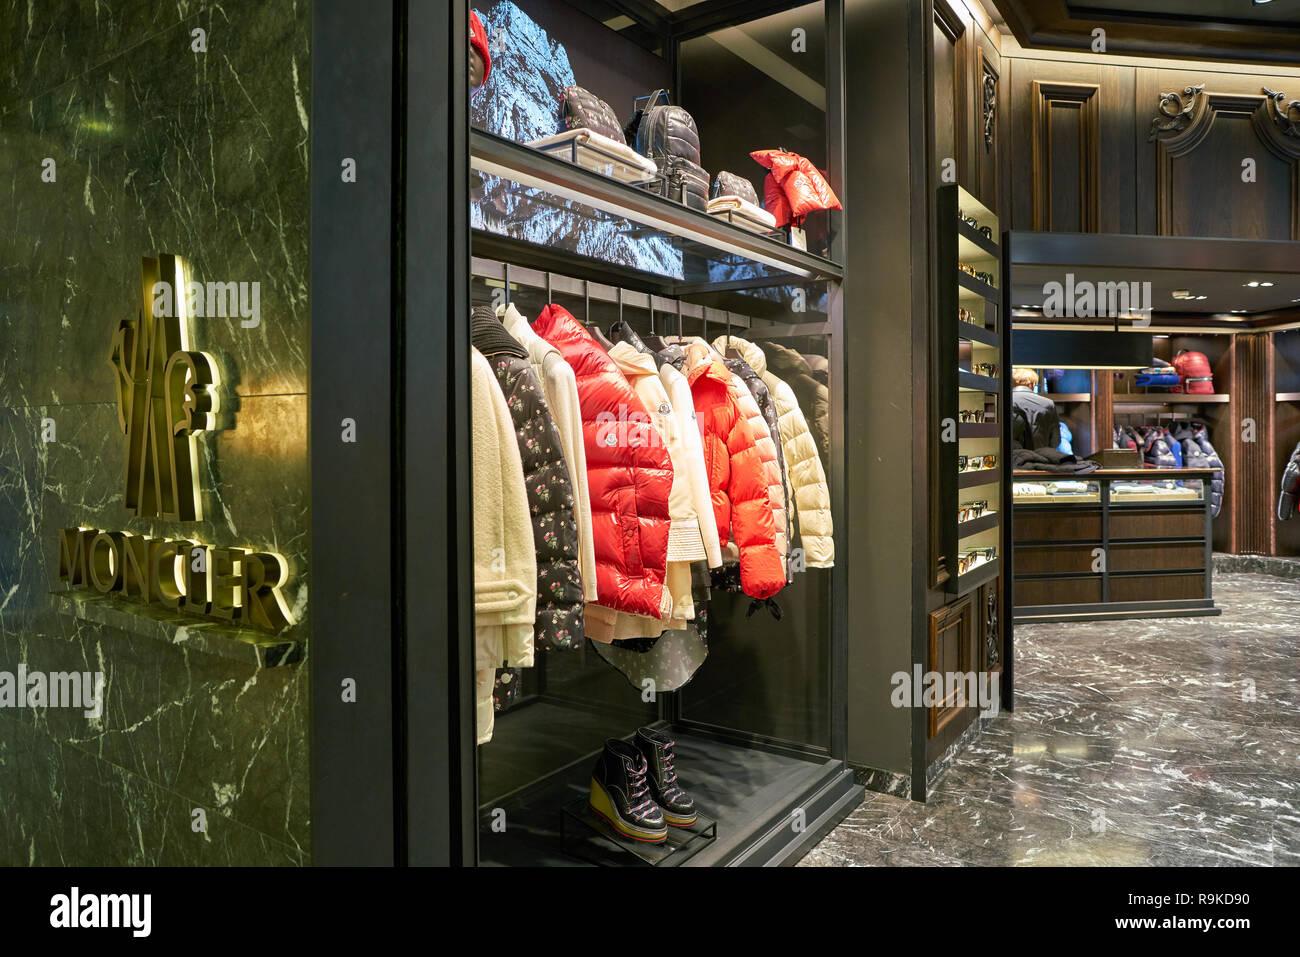 5a8b5b79e Moncler Shop Stock Photos   Moncler Shop Stock Images - Alamy